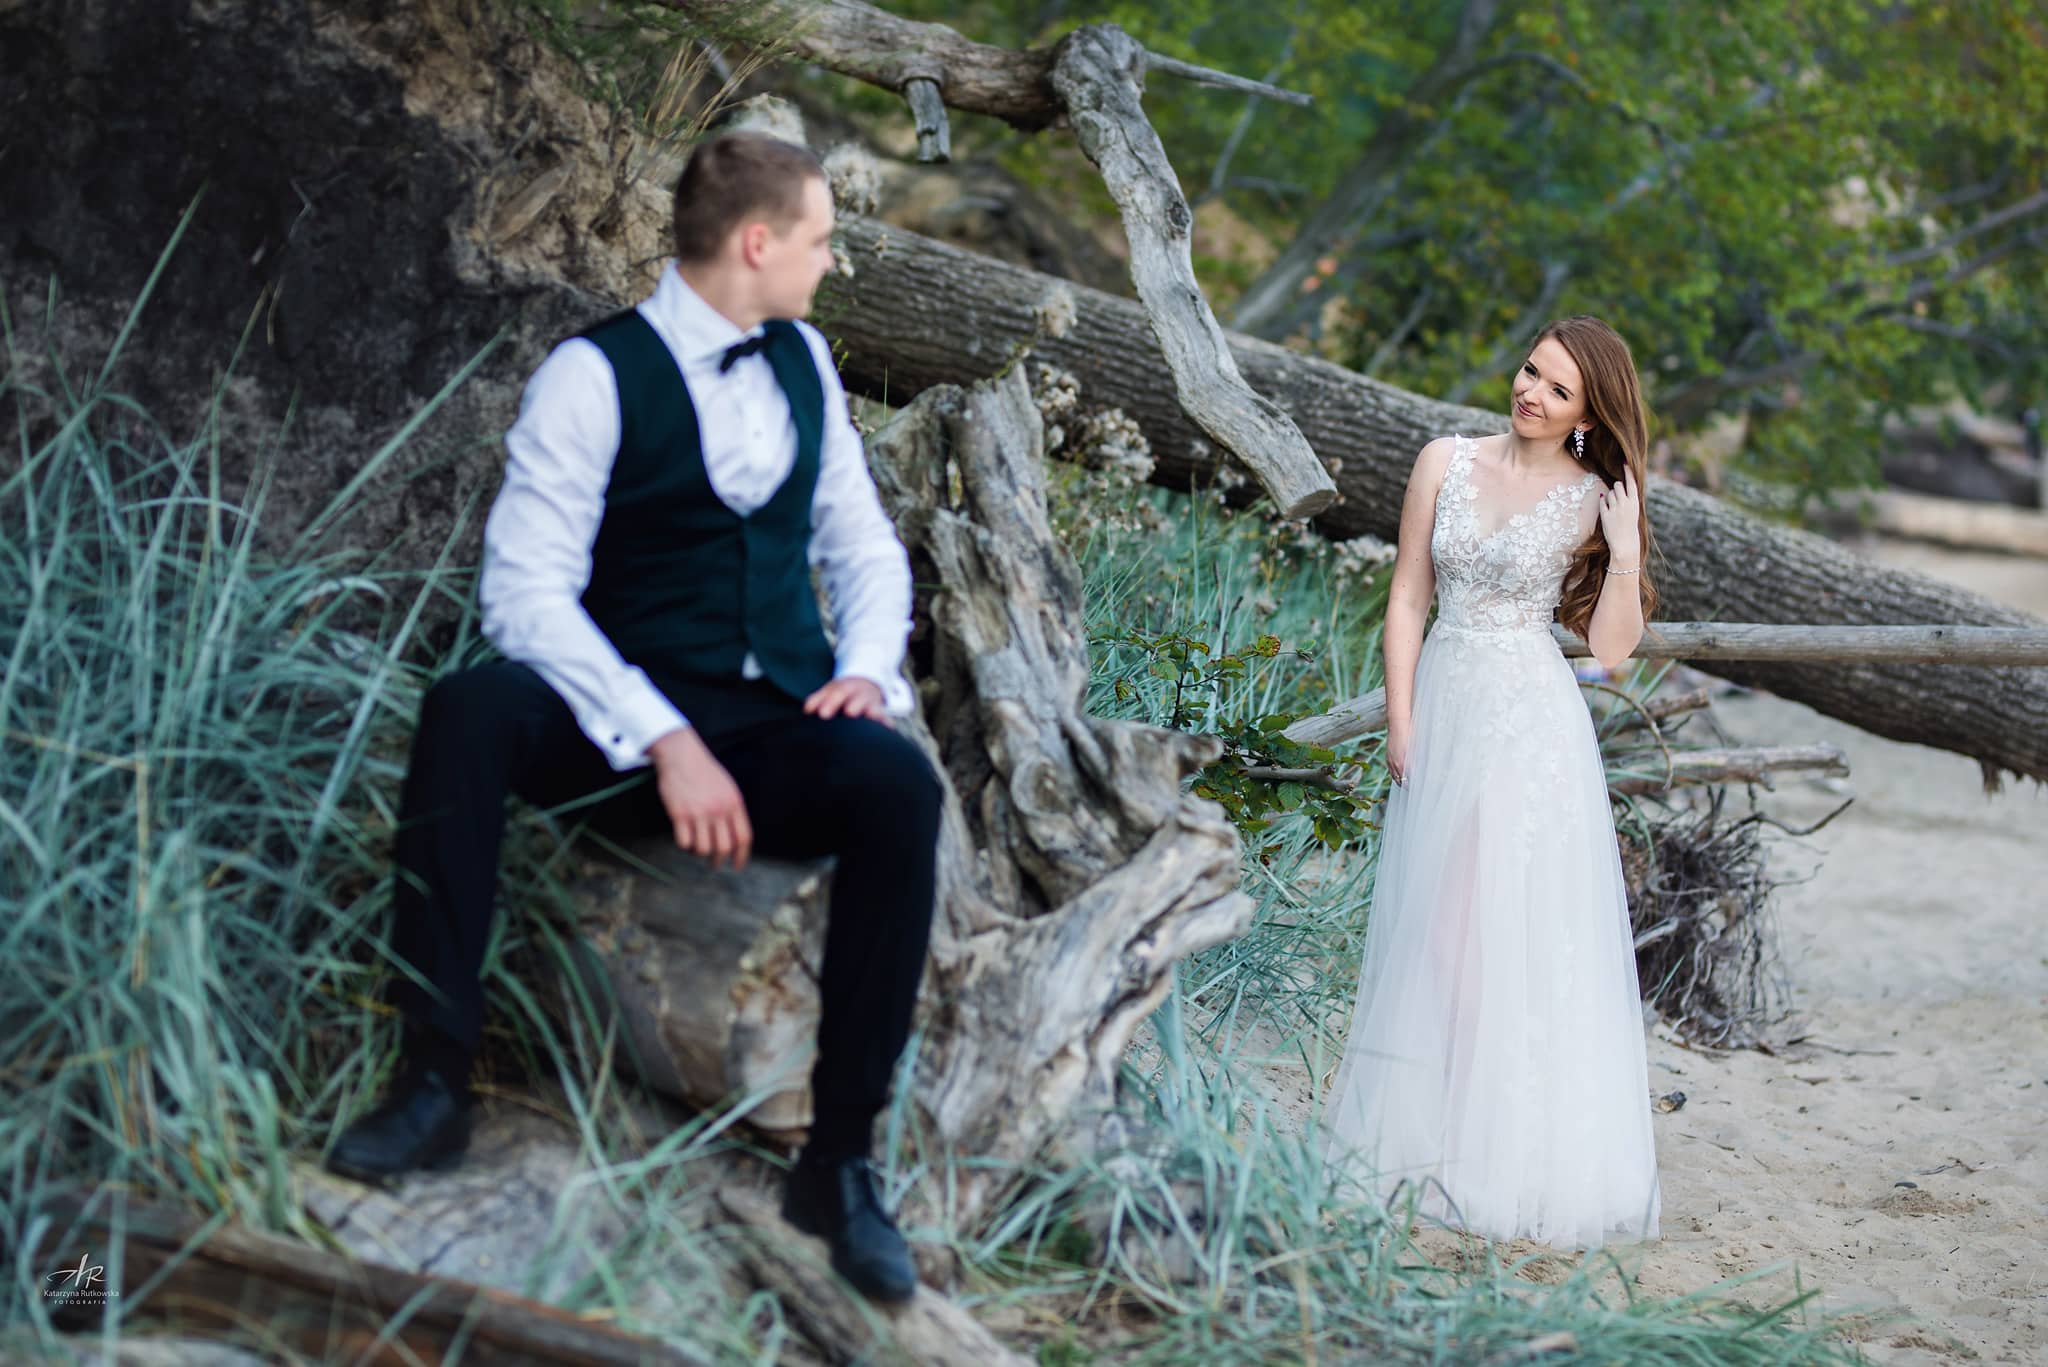 Sesja ślubna - Plener